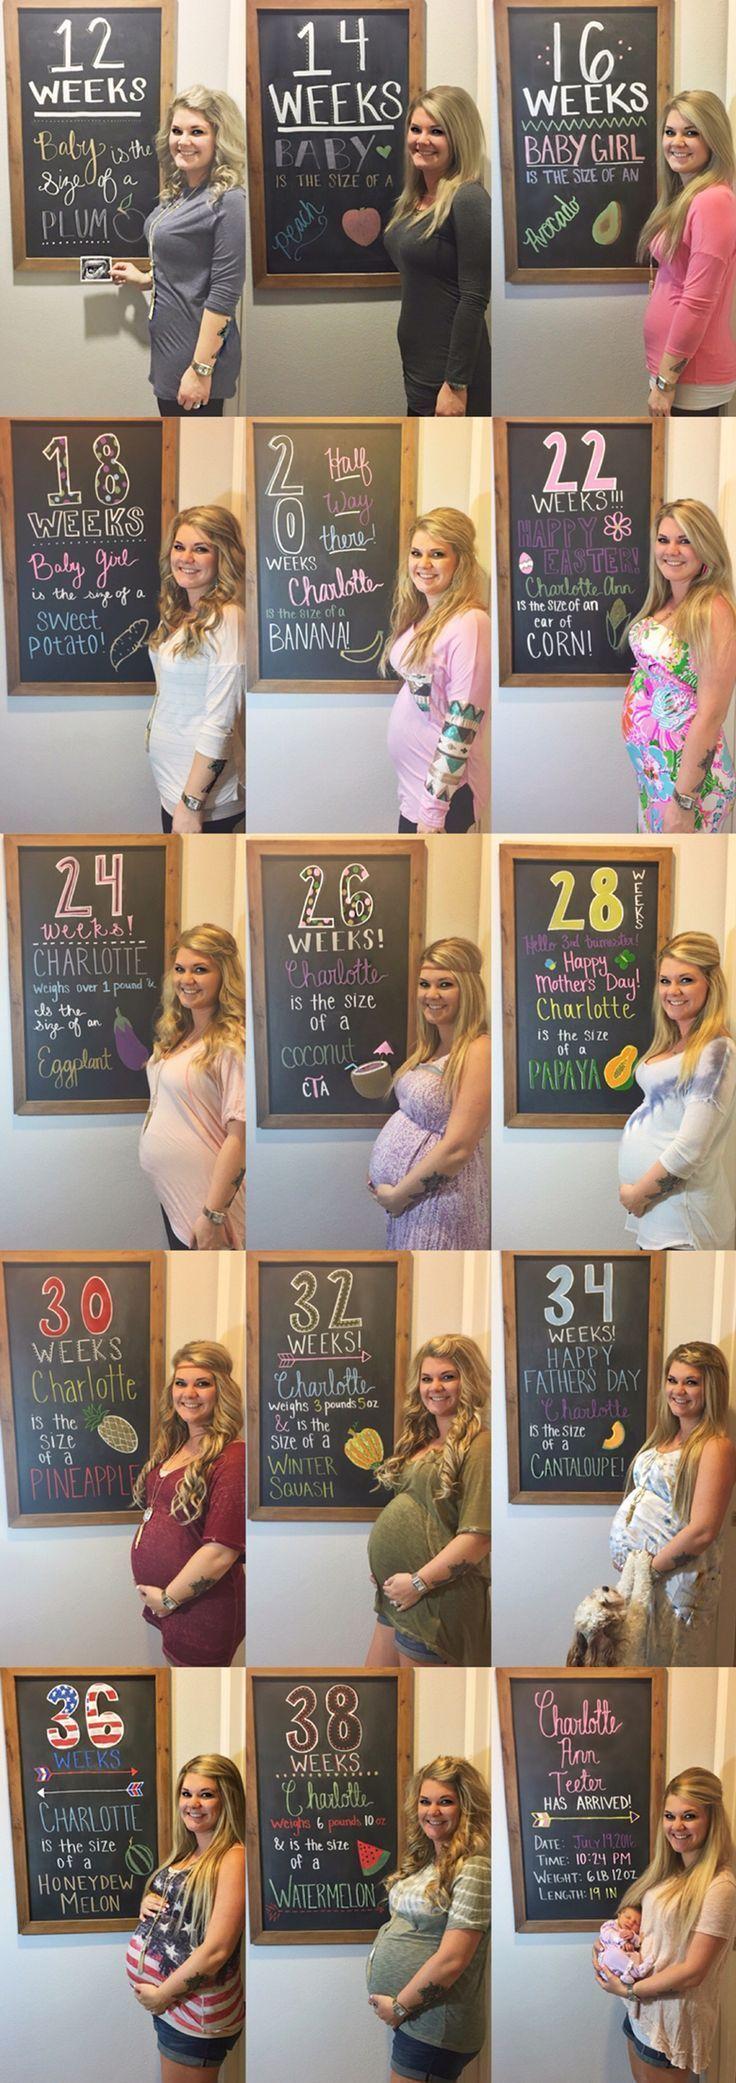 Weekly pregnancy chalkboard tracker, baby bump progress